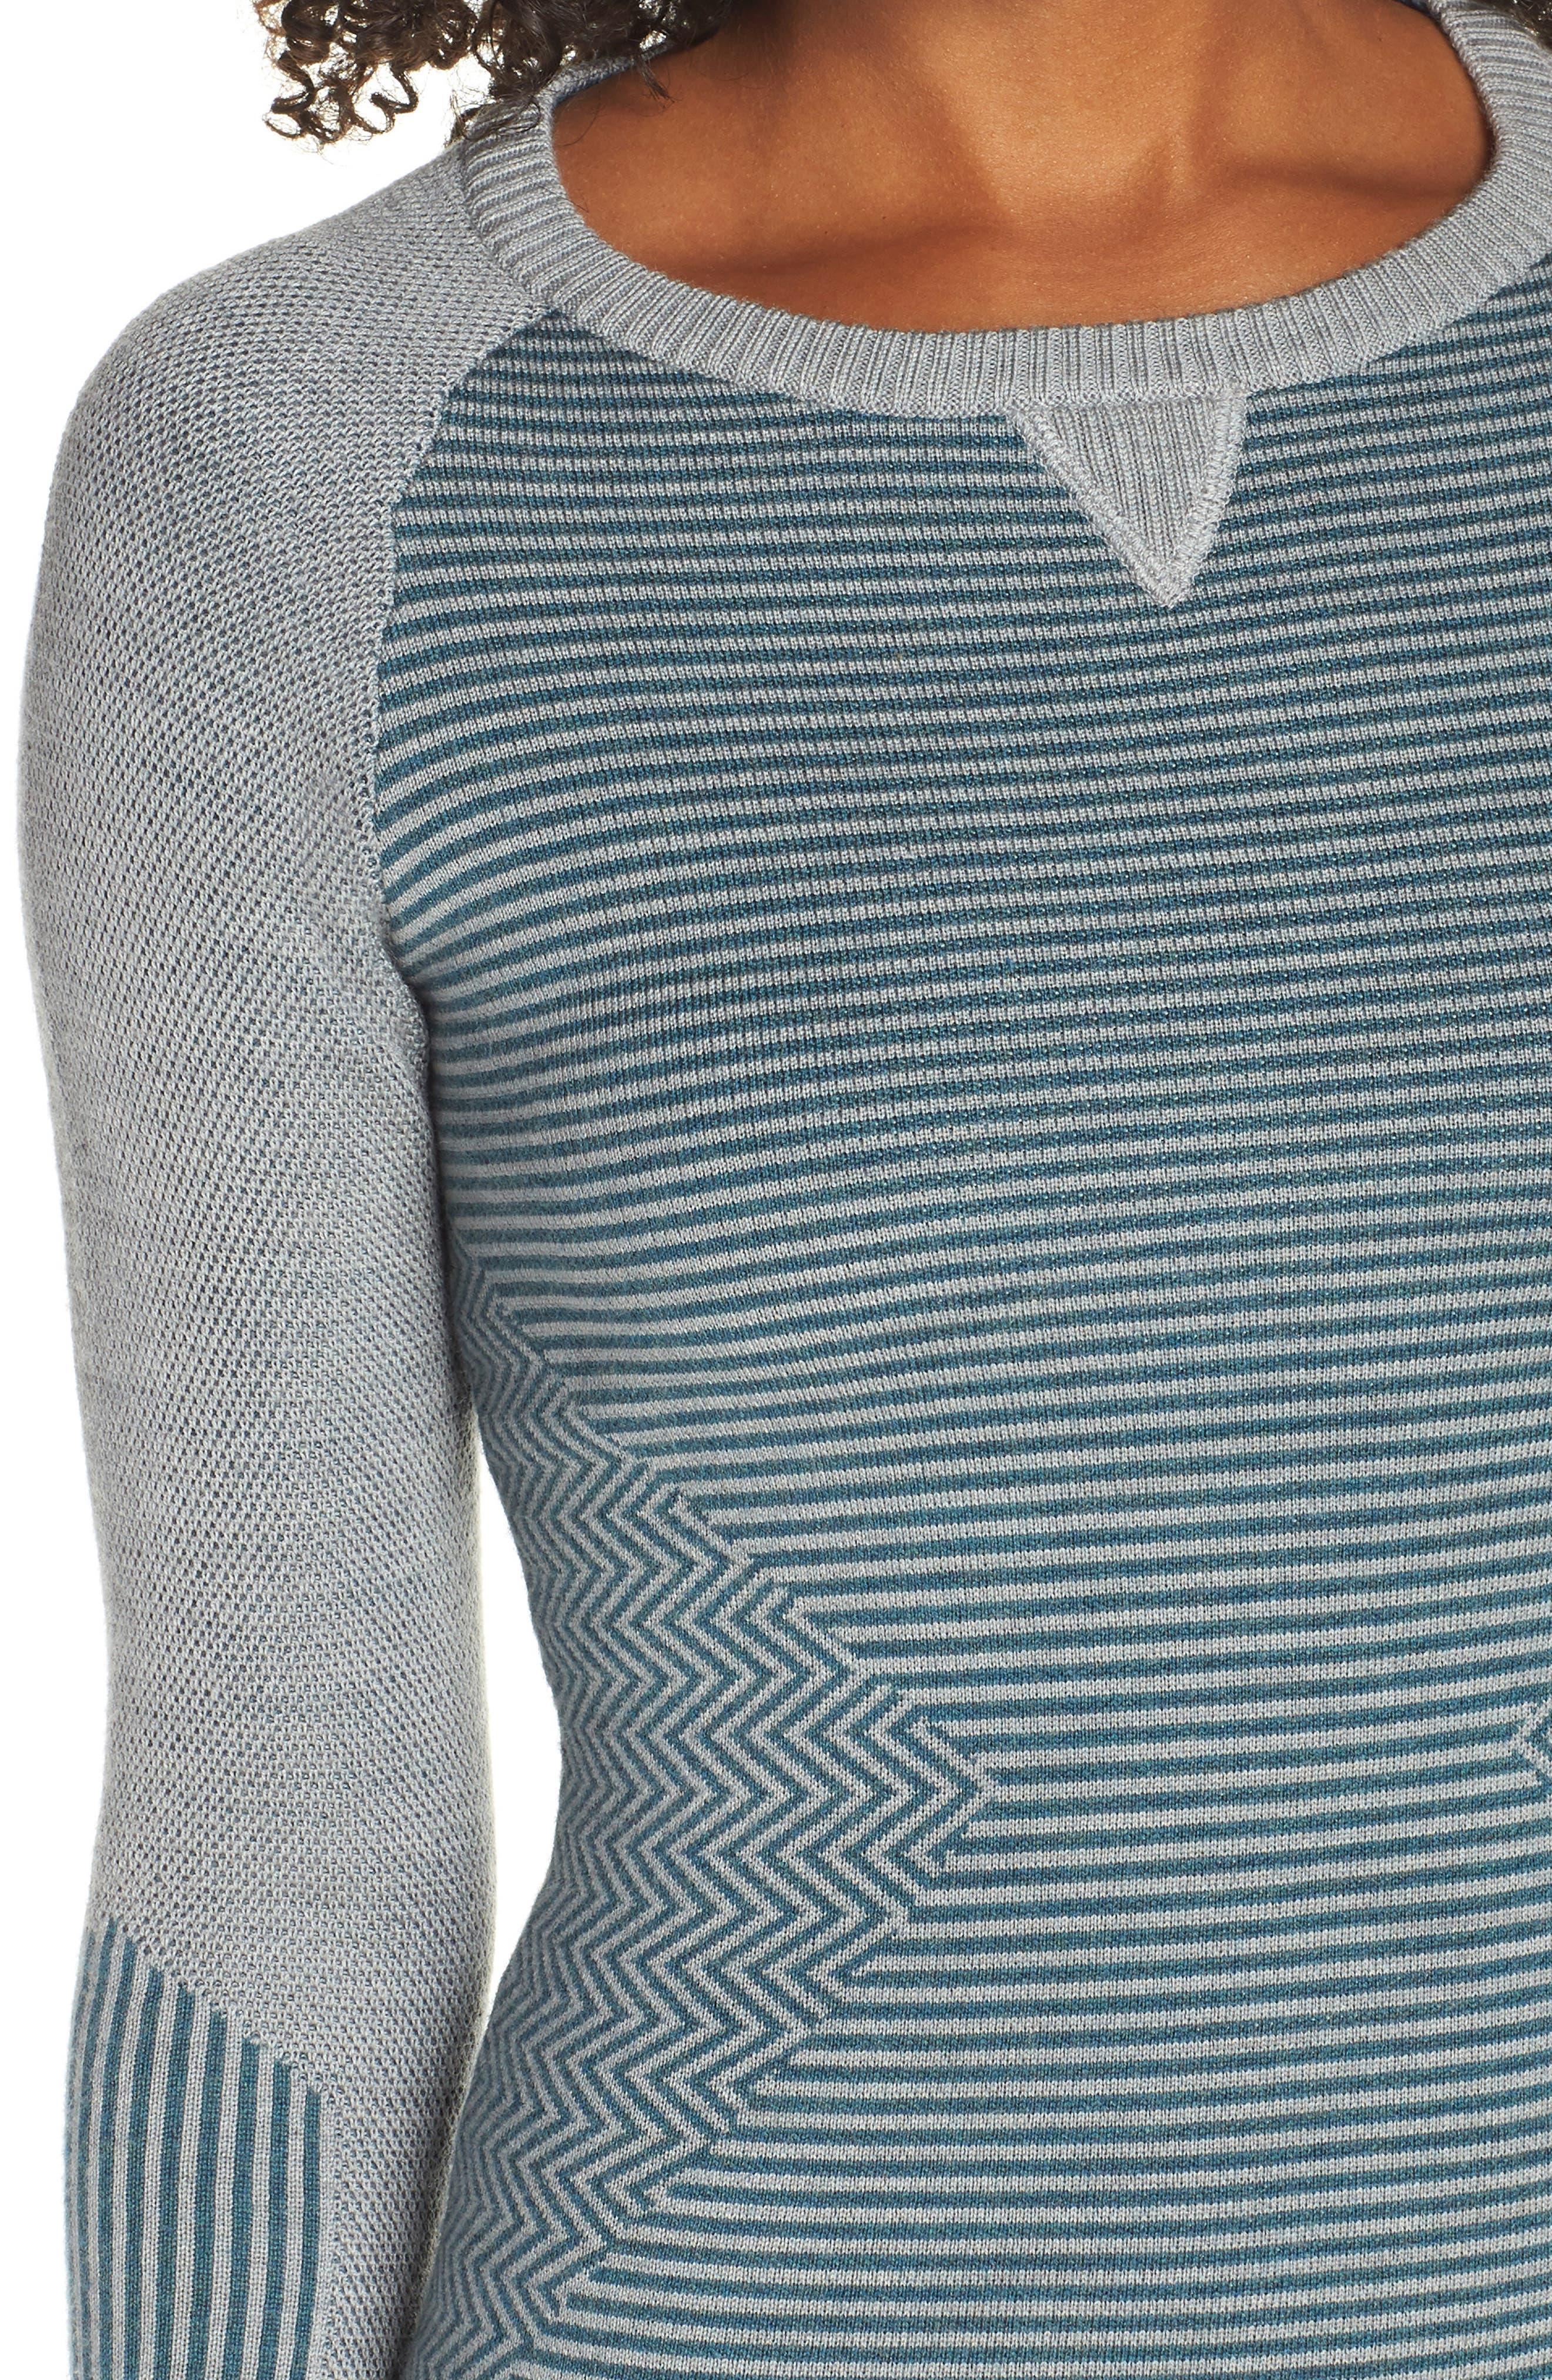 SMARTWOOL,                             Dacono Ski Sweater,                             Alternate thumbnail 4, color,                             310